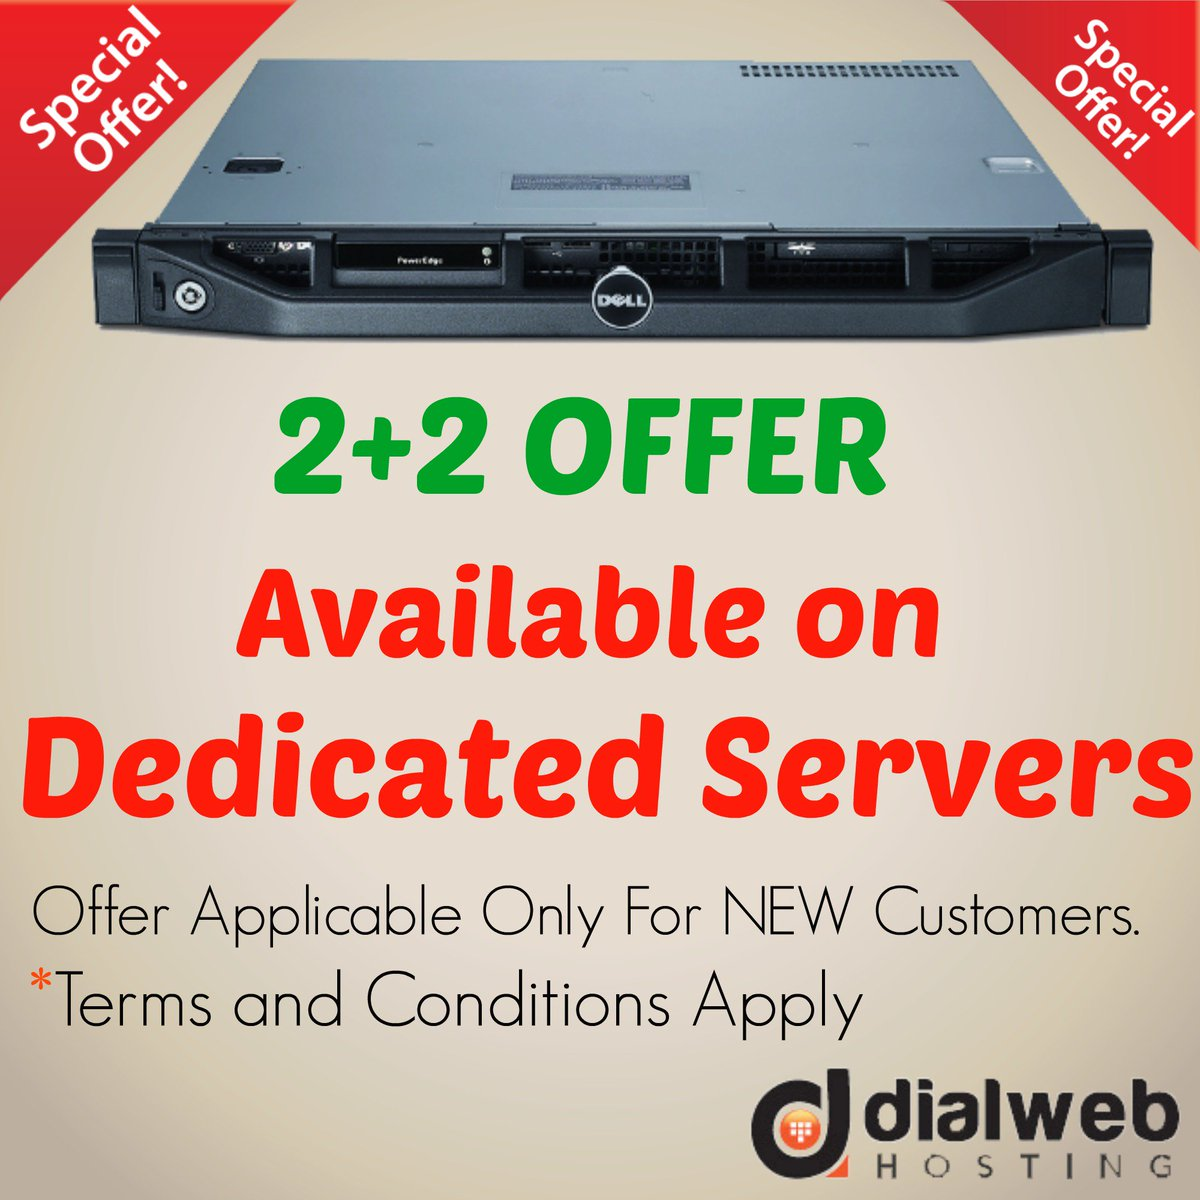 Dialwebhosting - USA Web Hosting Company